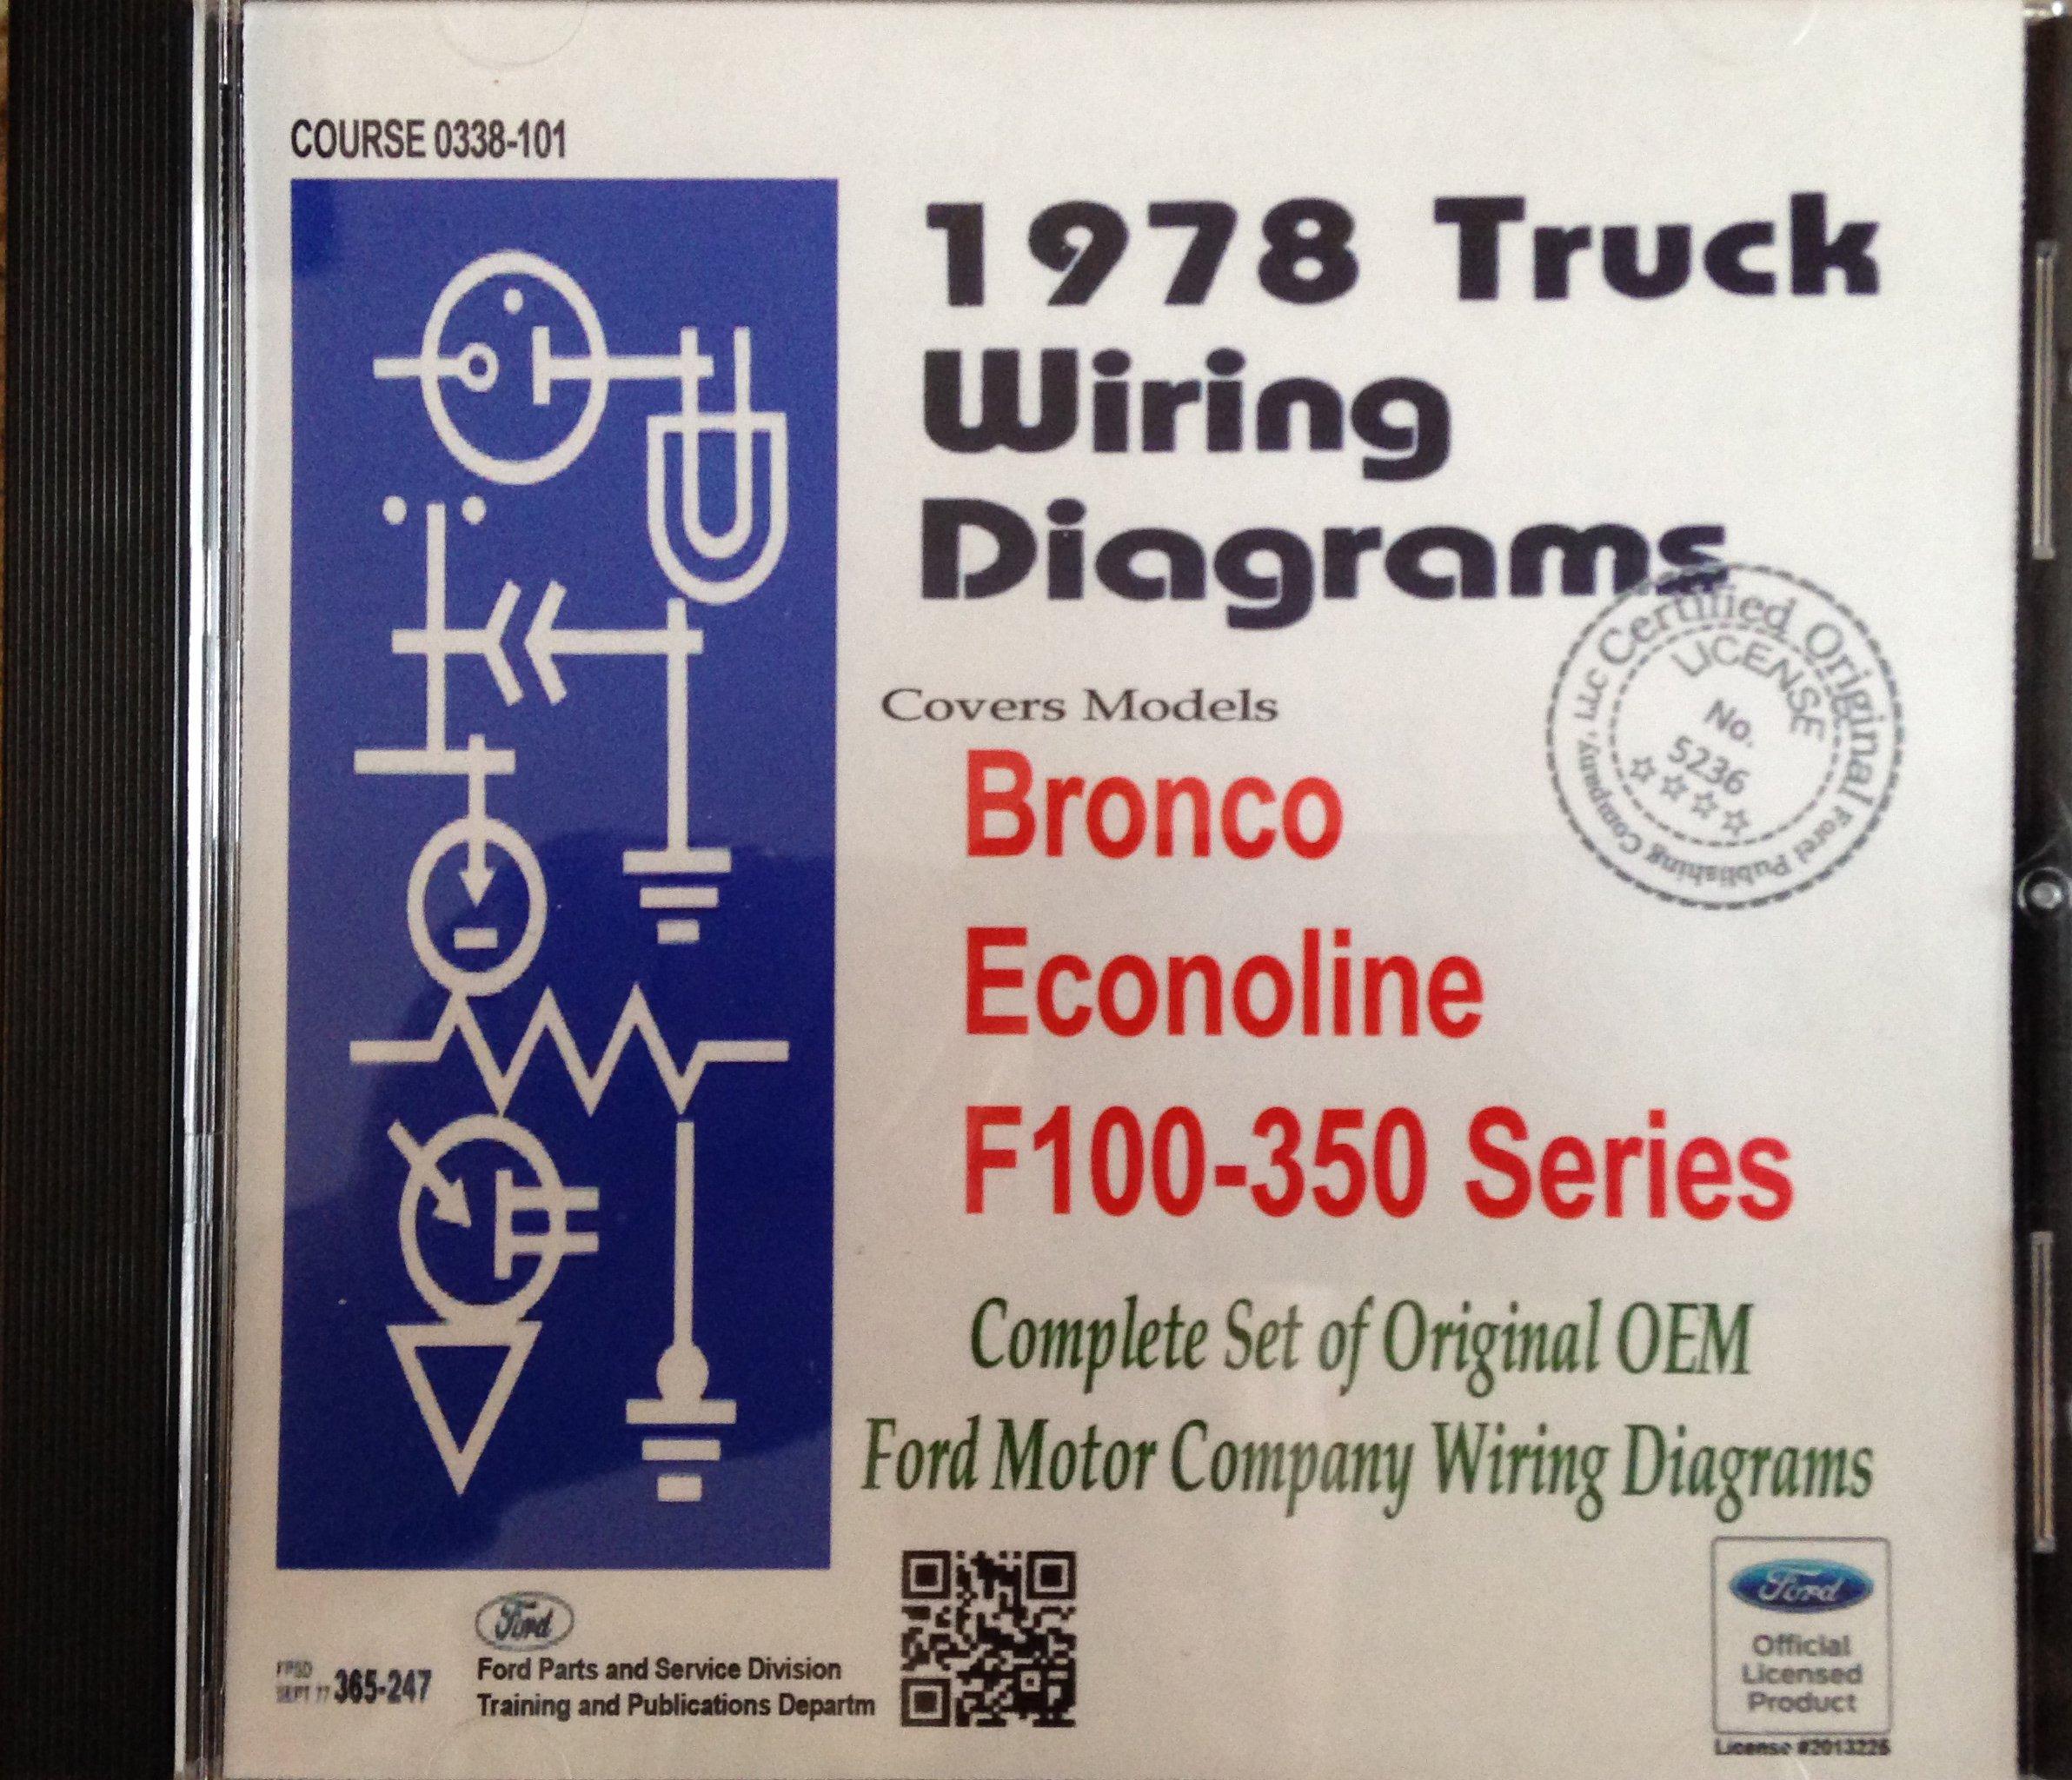 1978 Ford Truck Wiring Diagrams Bronco Econoline F100 350 Series Engine Diagram Motor Company 9781603712064 Books